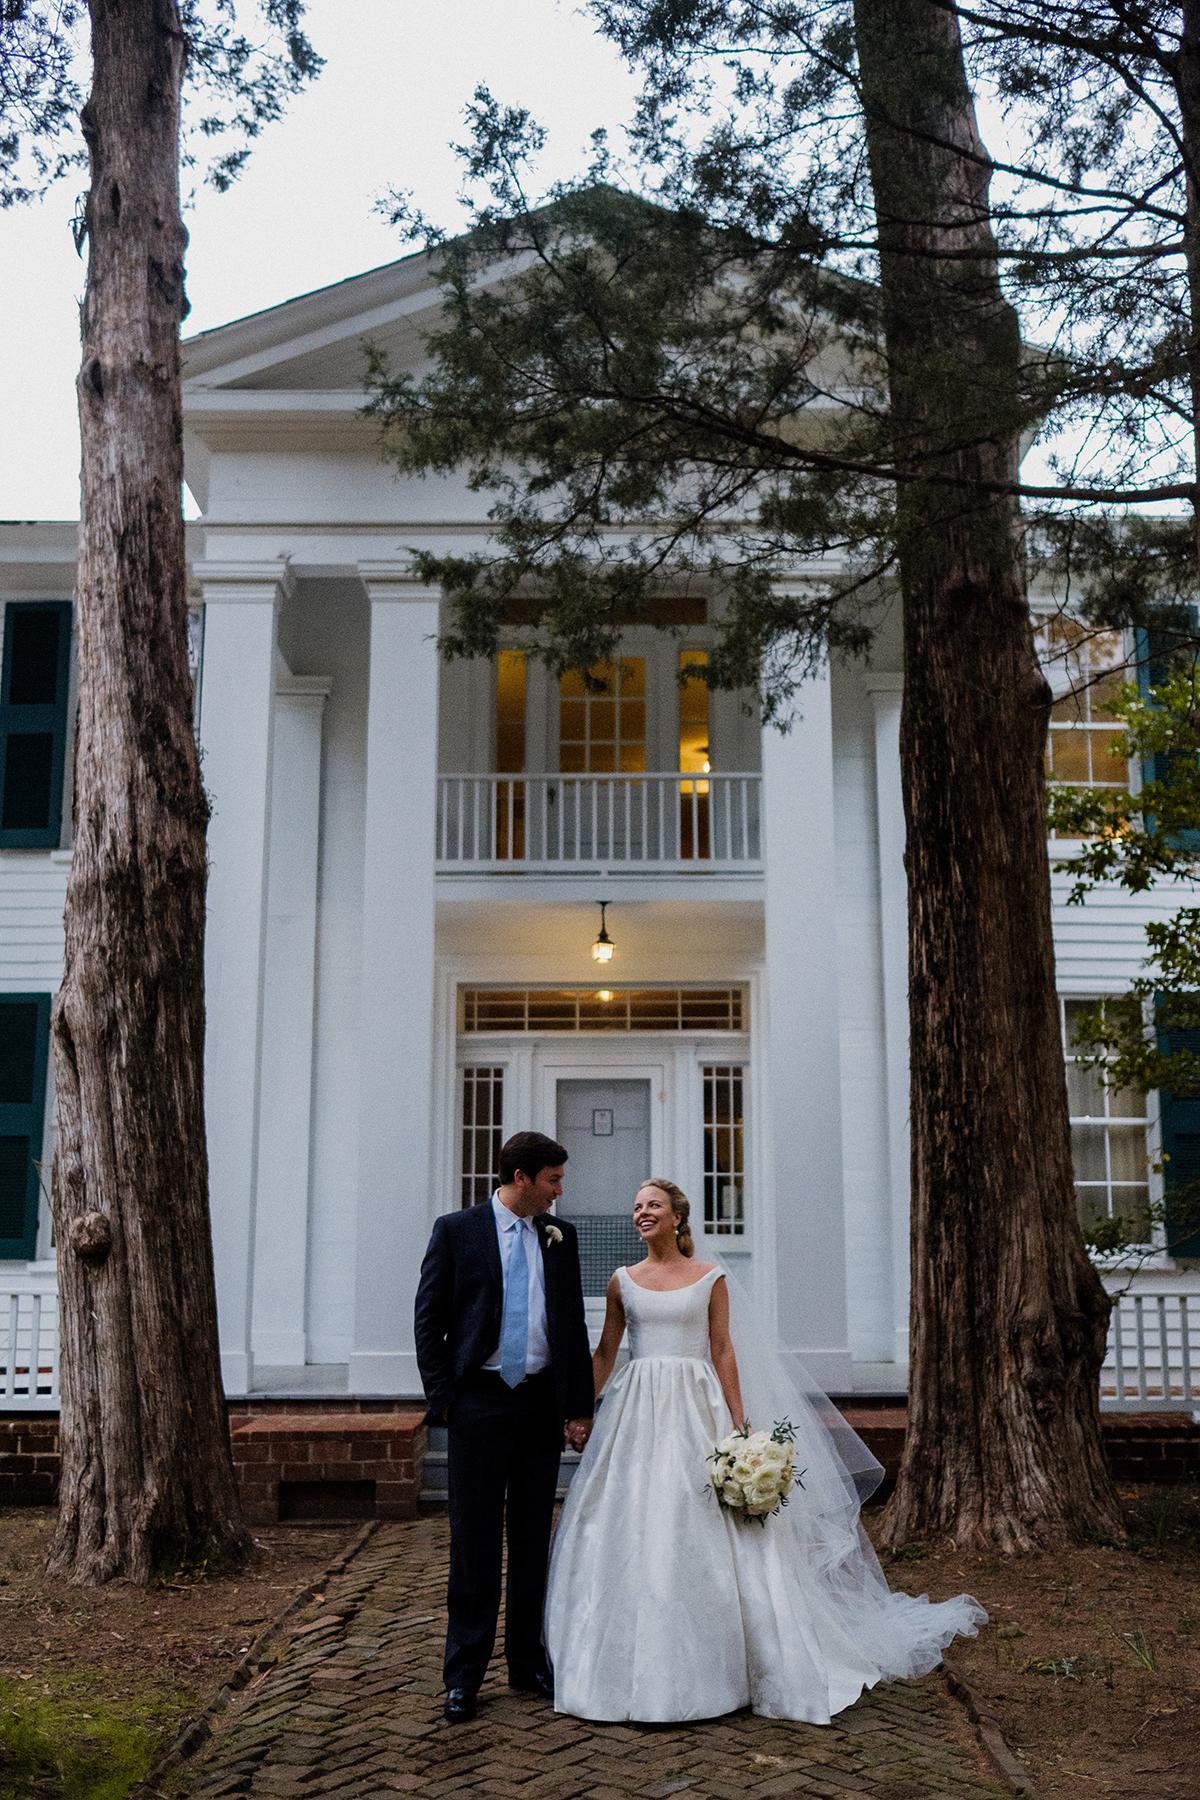 Oxford_Mississippi_Wedding_Photographer_44.jpg